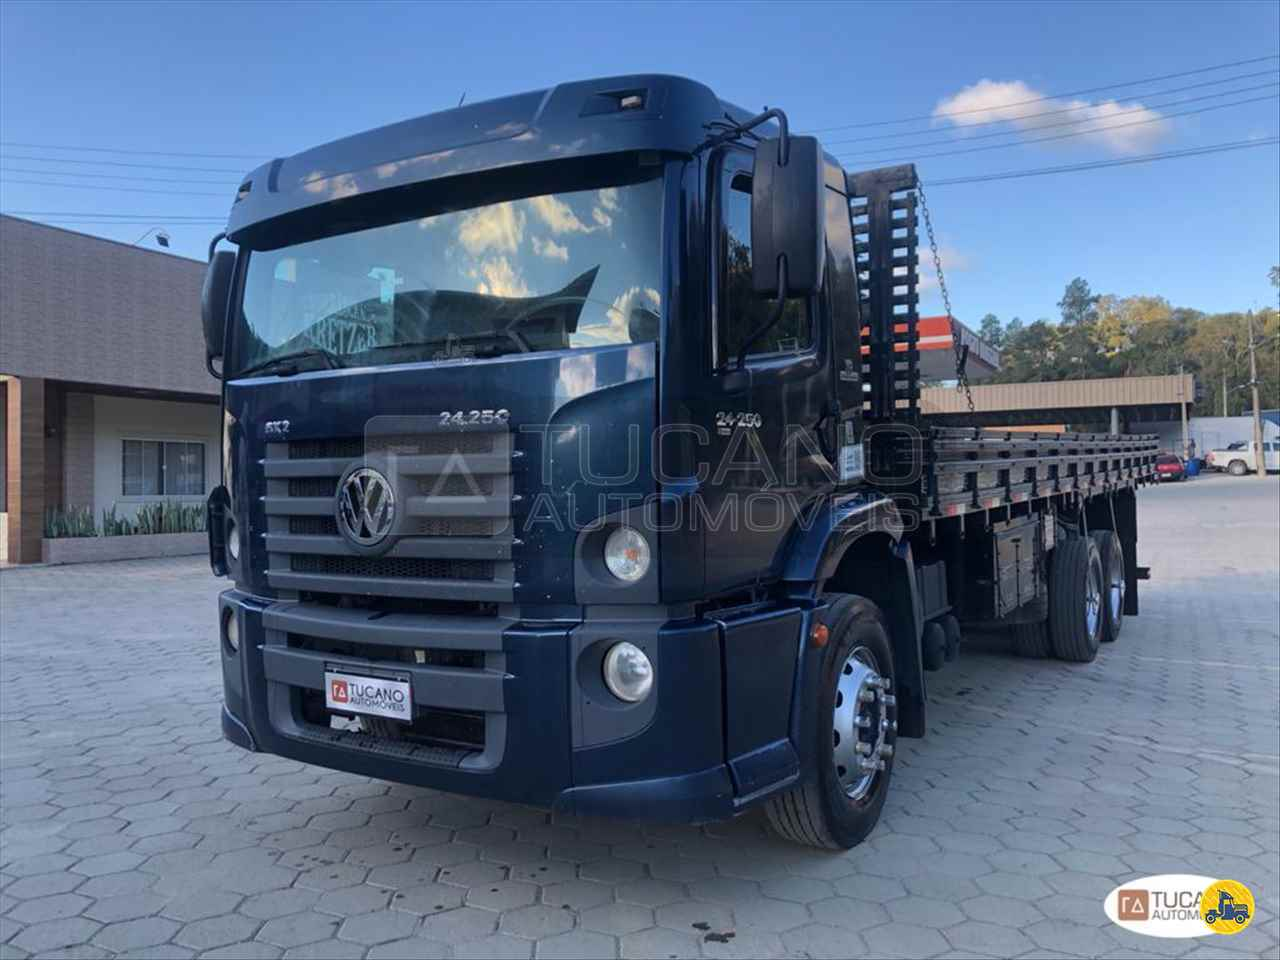 CAMINHAO VOLKSWAGEN VW 24250 Carga Seca Truck 6x2 Tucano Automóveis ALFREDO WAGNER SANTA CATARINA SC